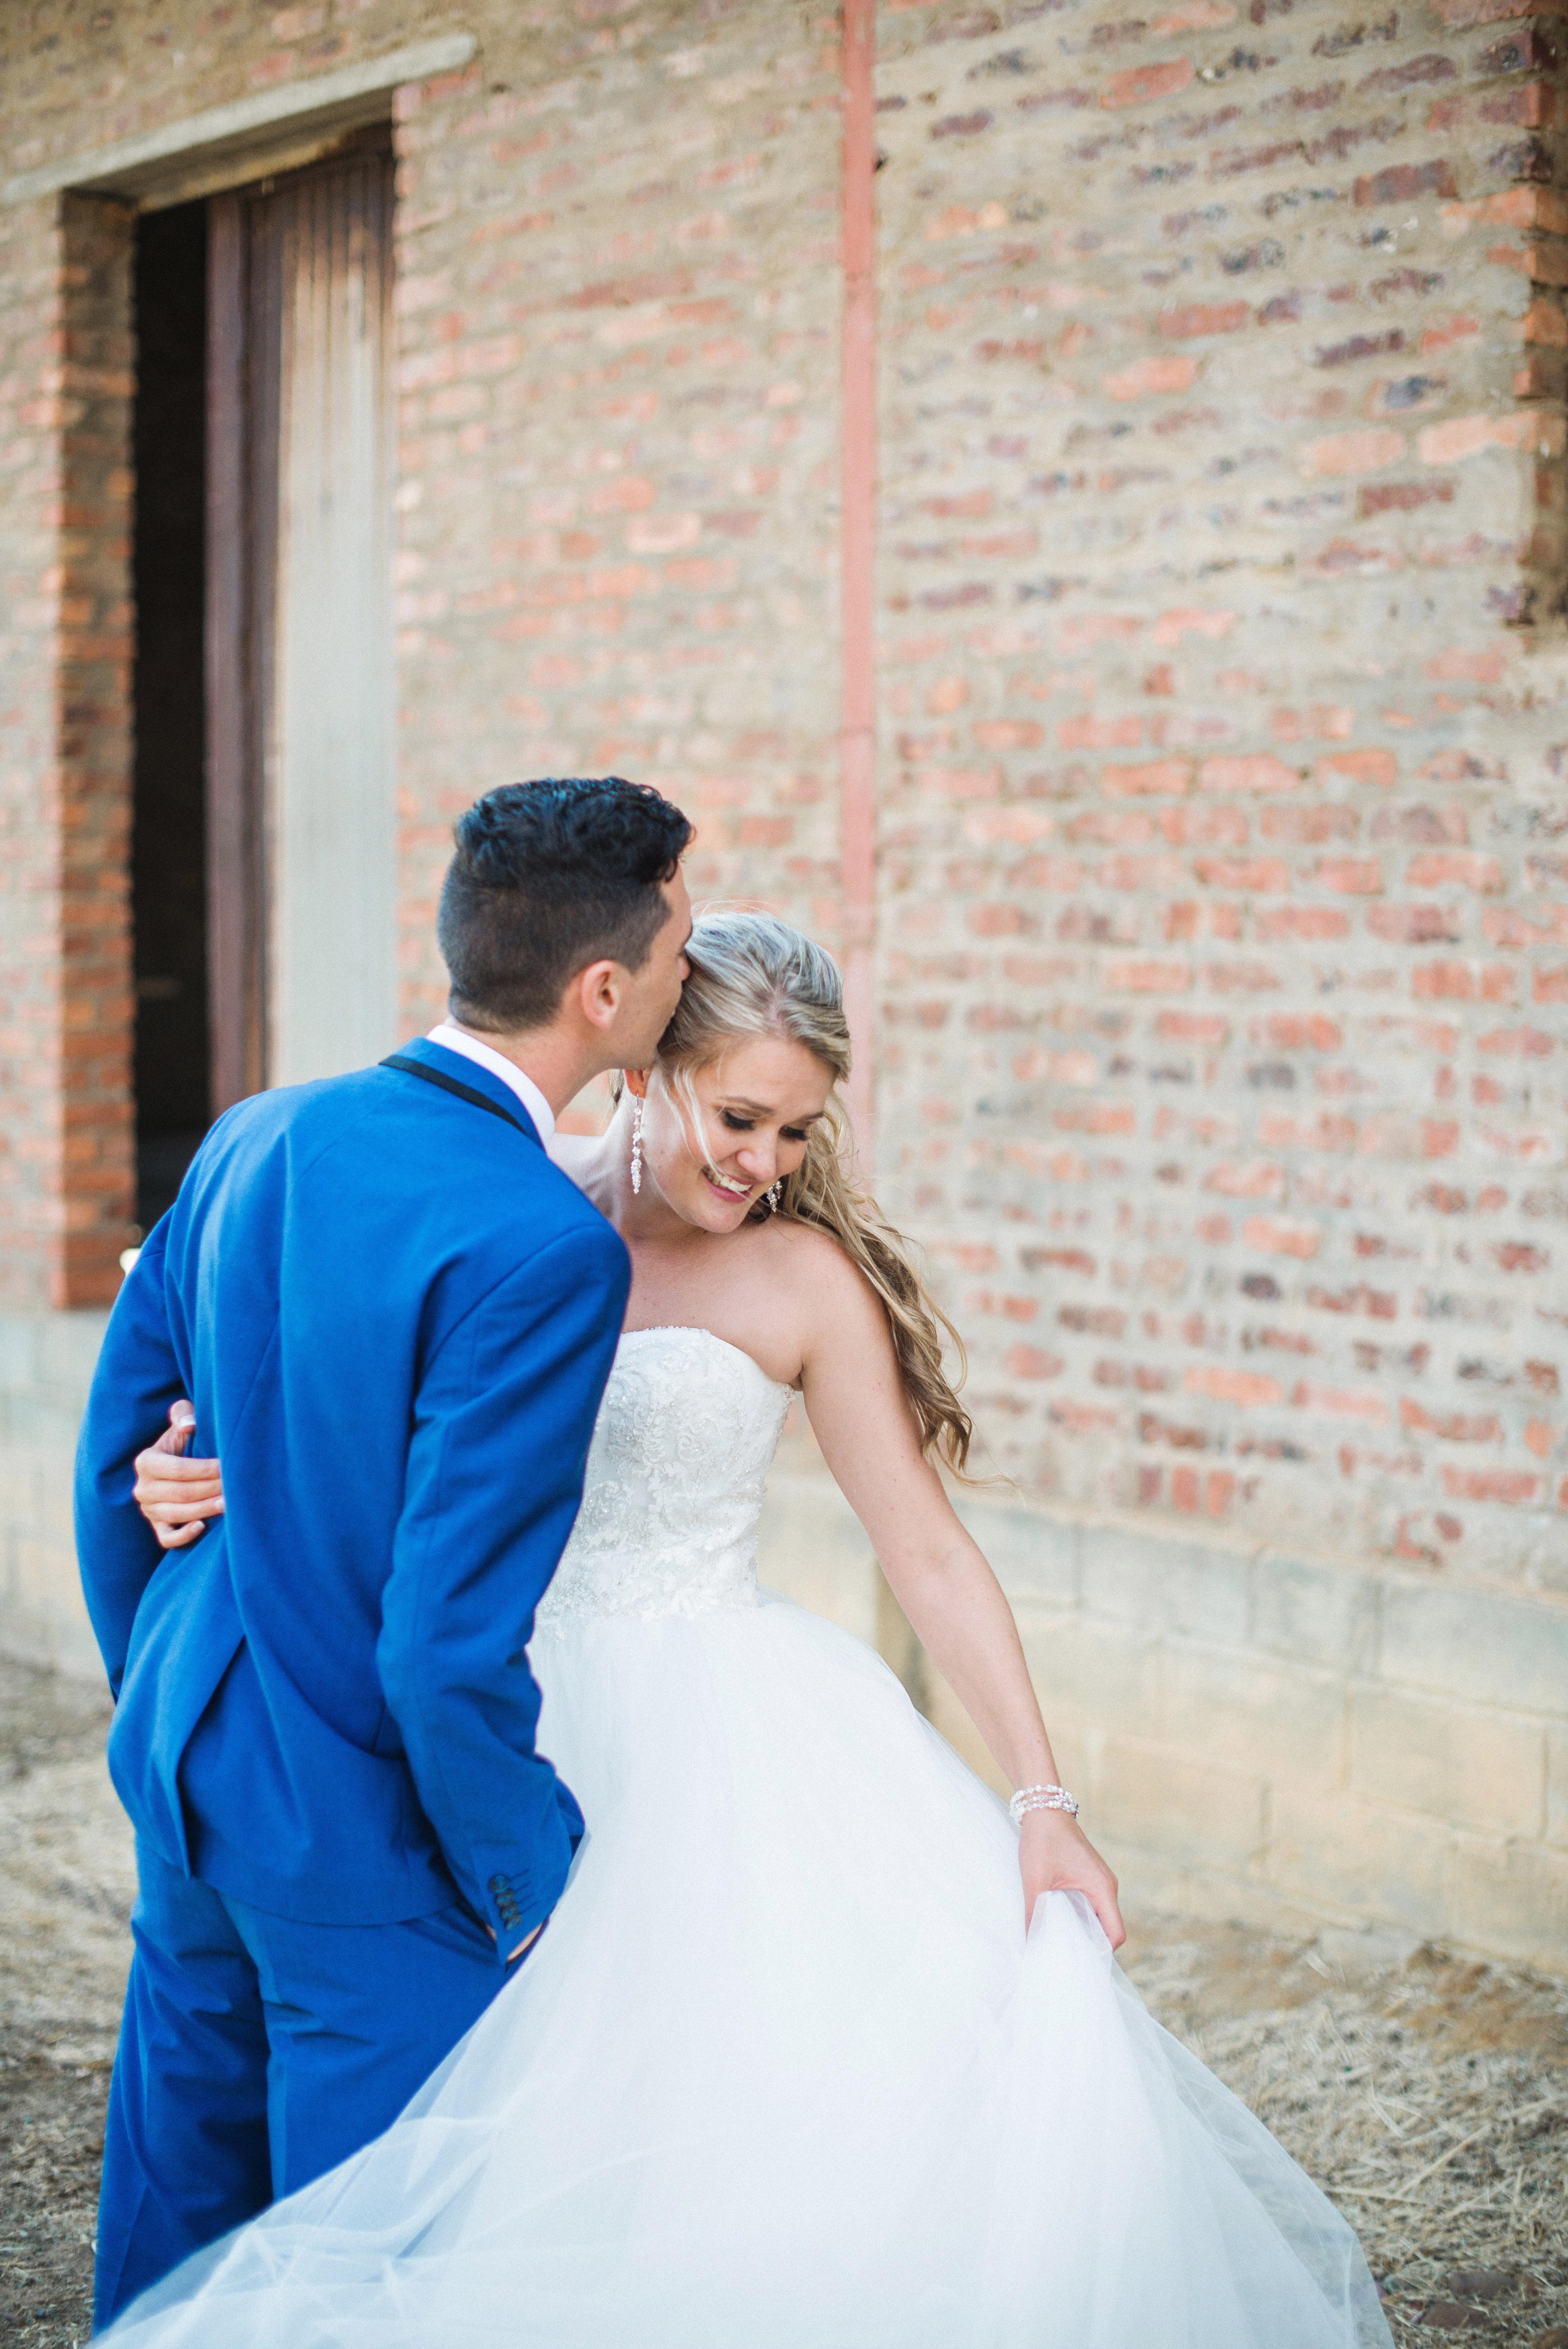 573526239 hombre mujer masculino amor Boda vestido de novia novia novio matrimonio  vestido blanco ceremonia vestir fotografía